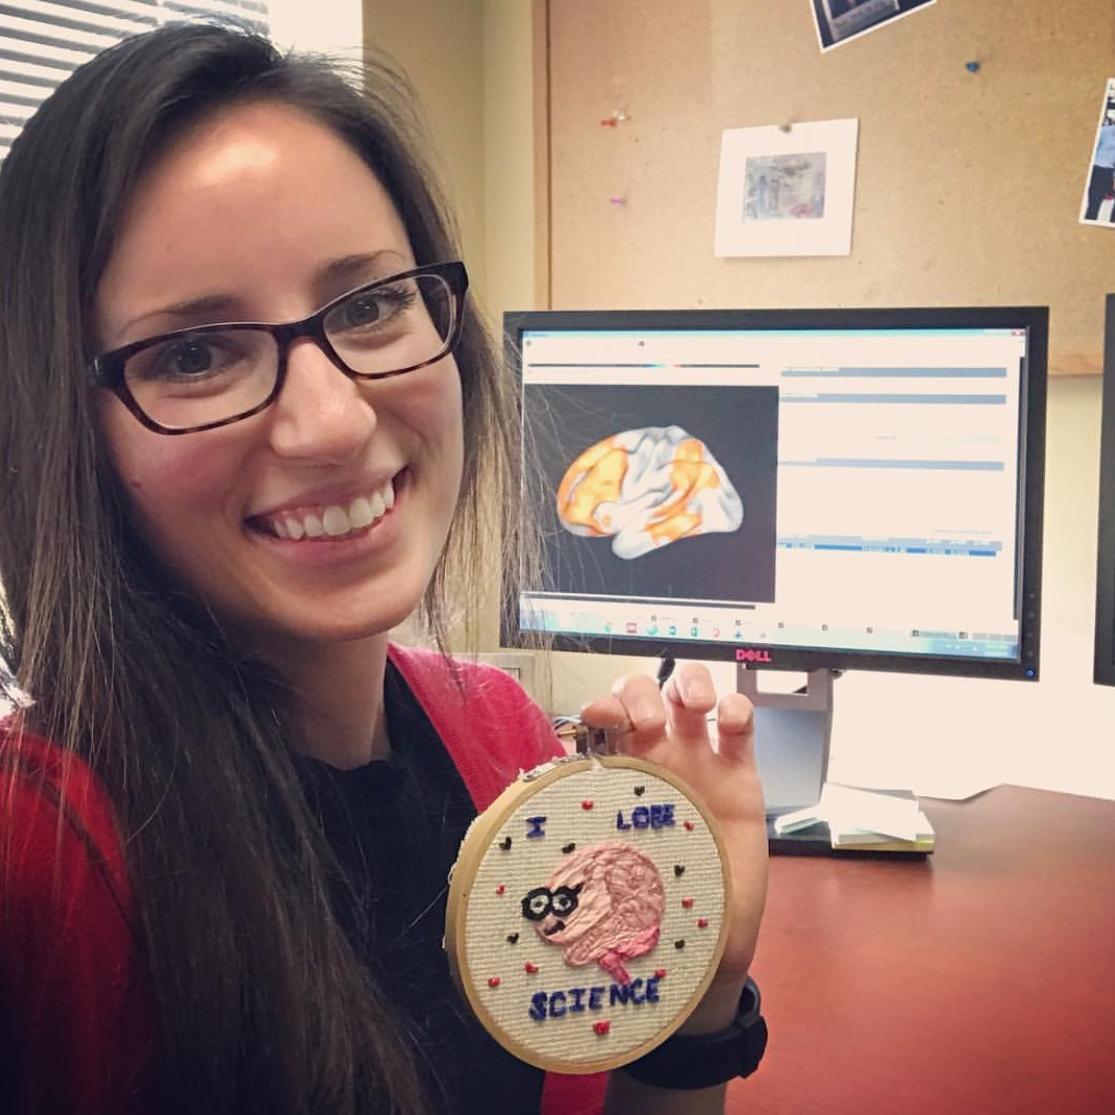 Janelle Letzen  @the_sushi_scientist Specialty: Neuroscience